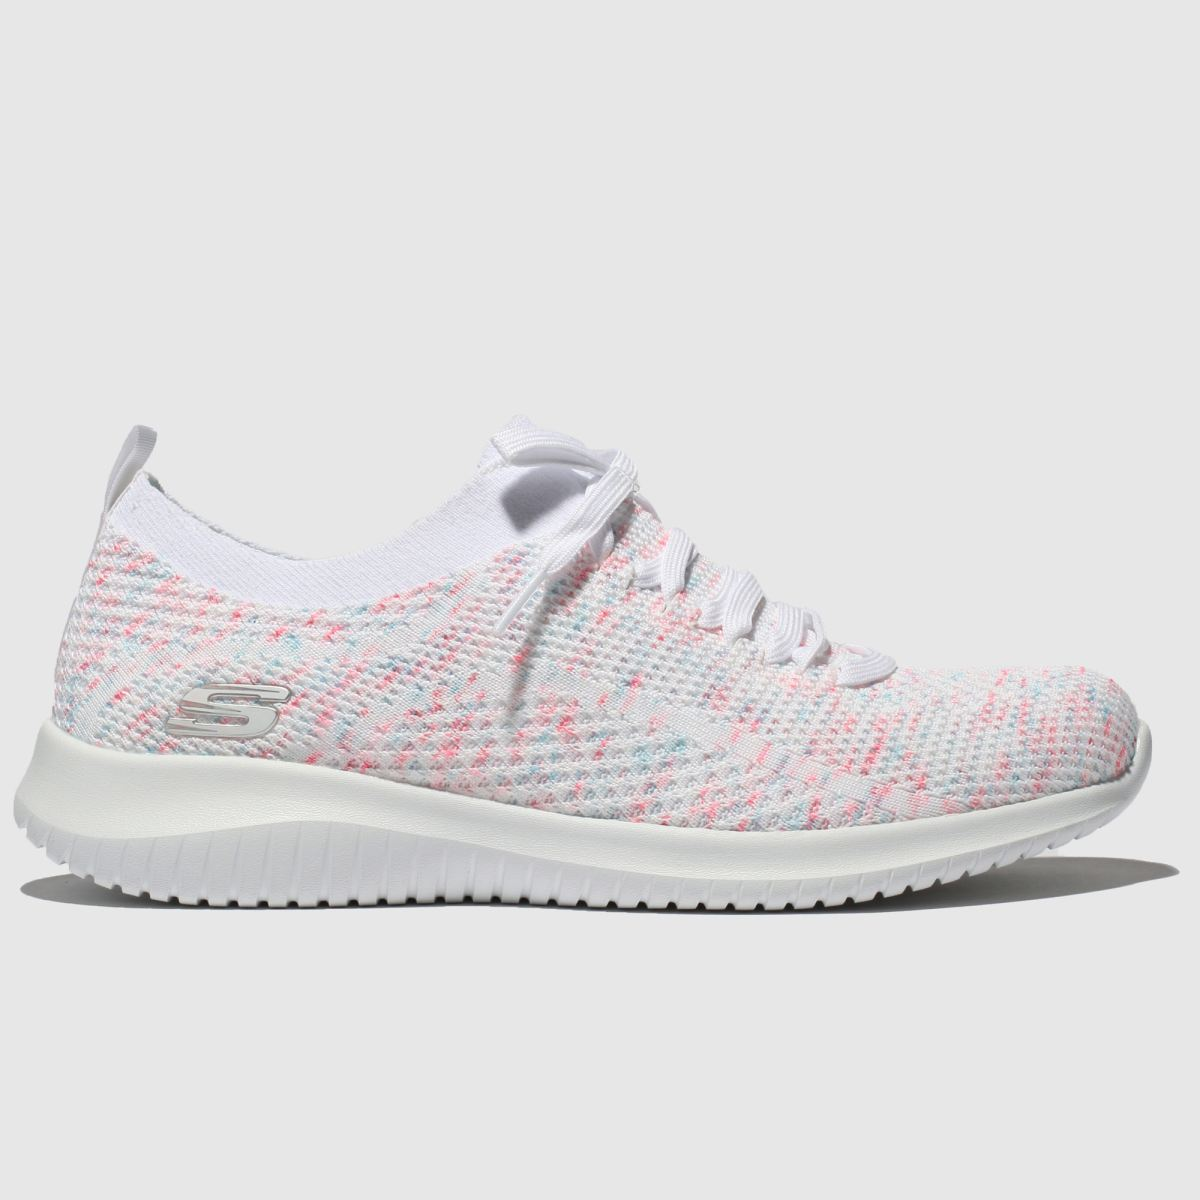 Skechers White & Pink Ultra Flex Happy Days Trainers